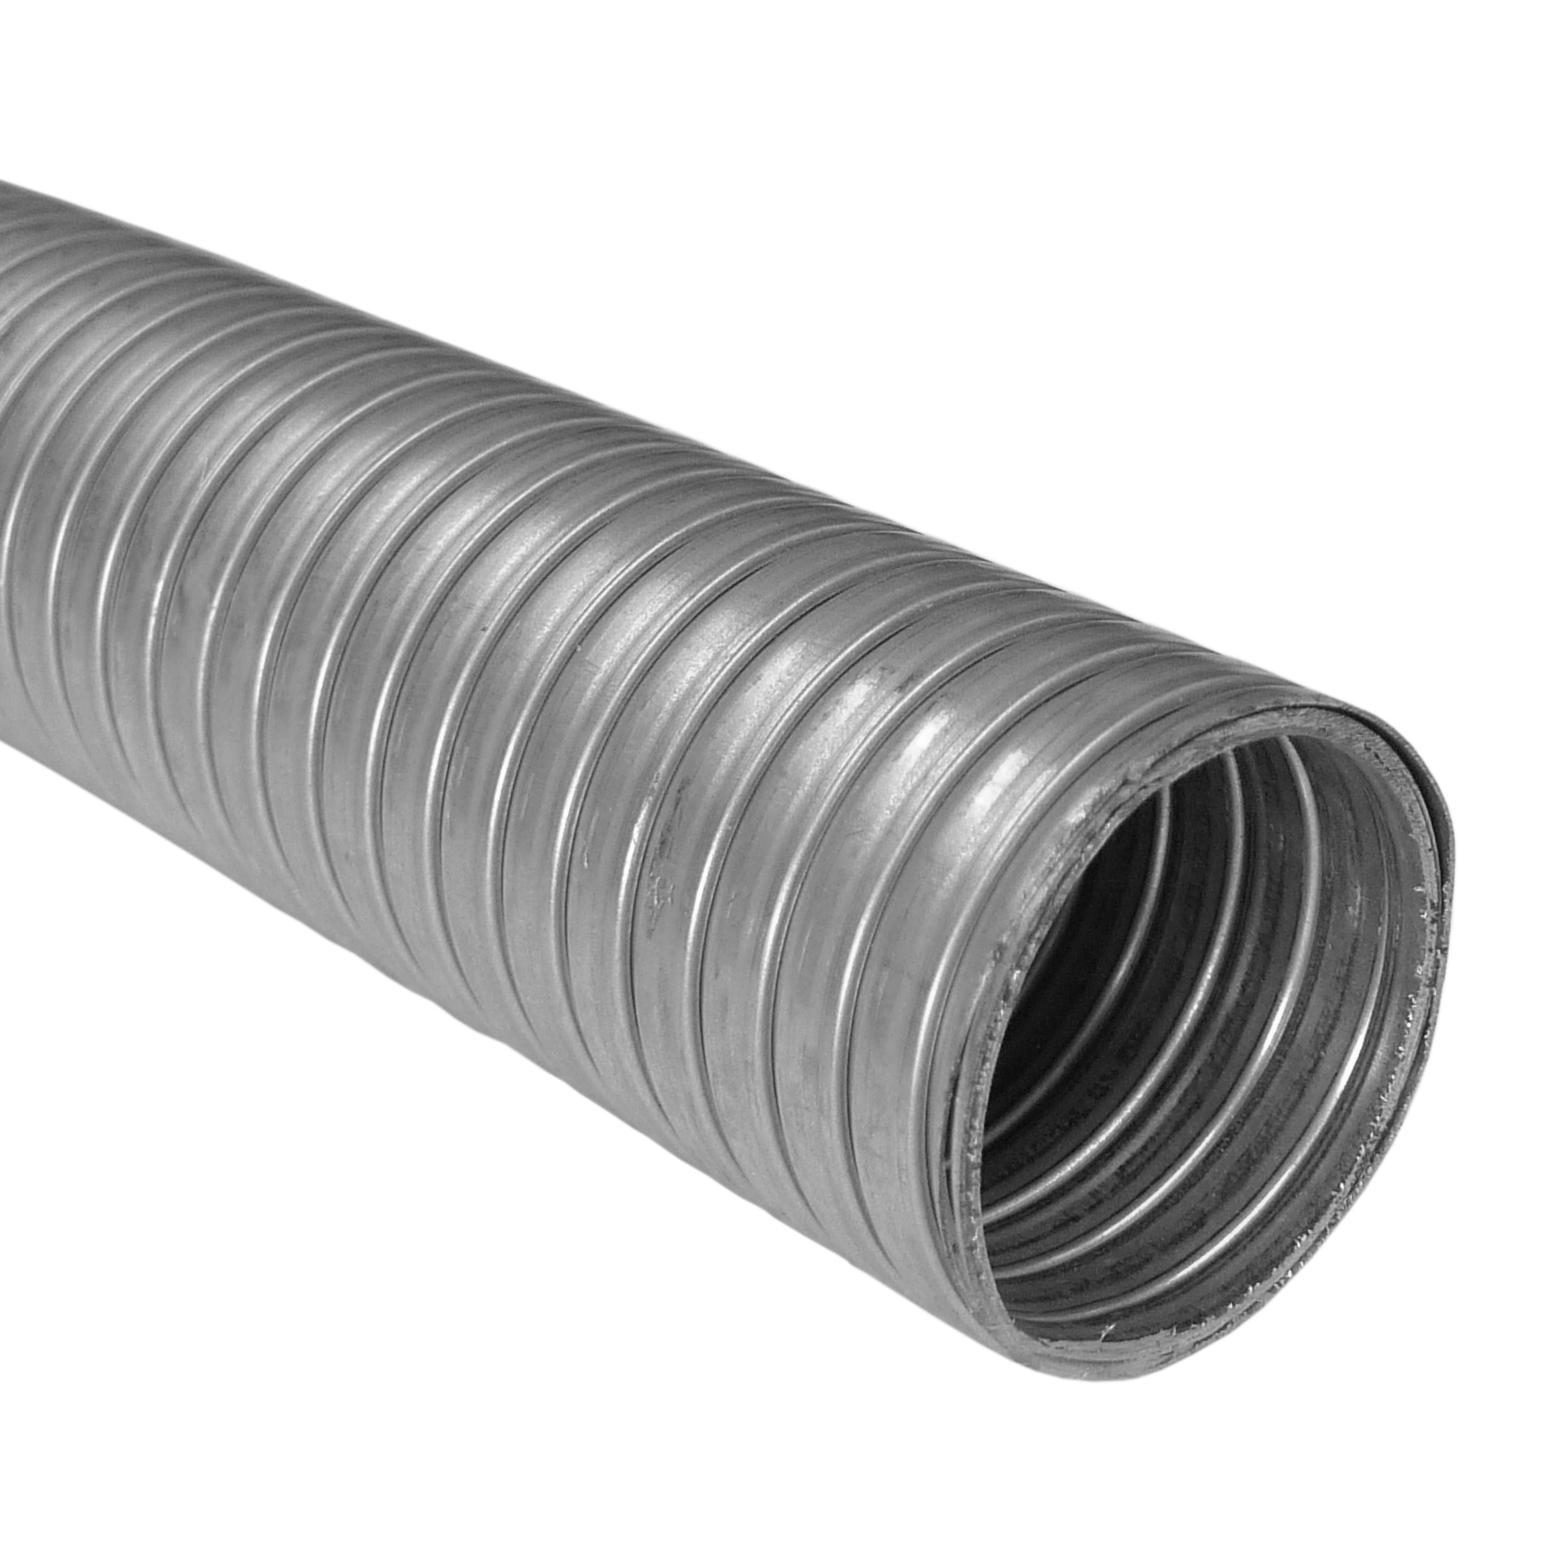 flexible pipe per 1 2 metre 2 5 inch